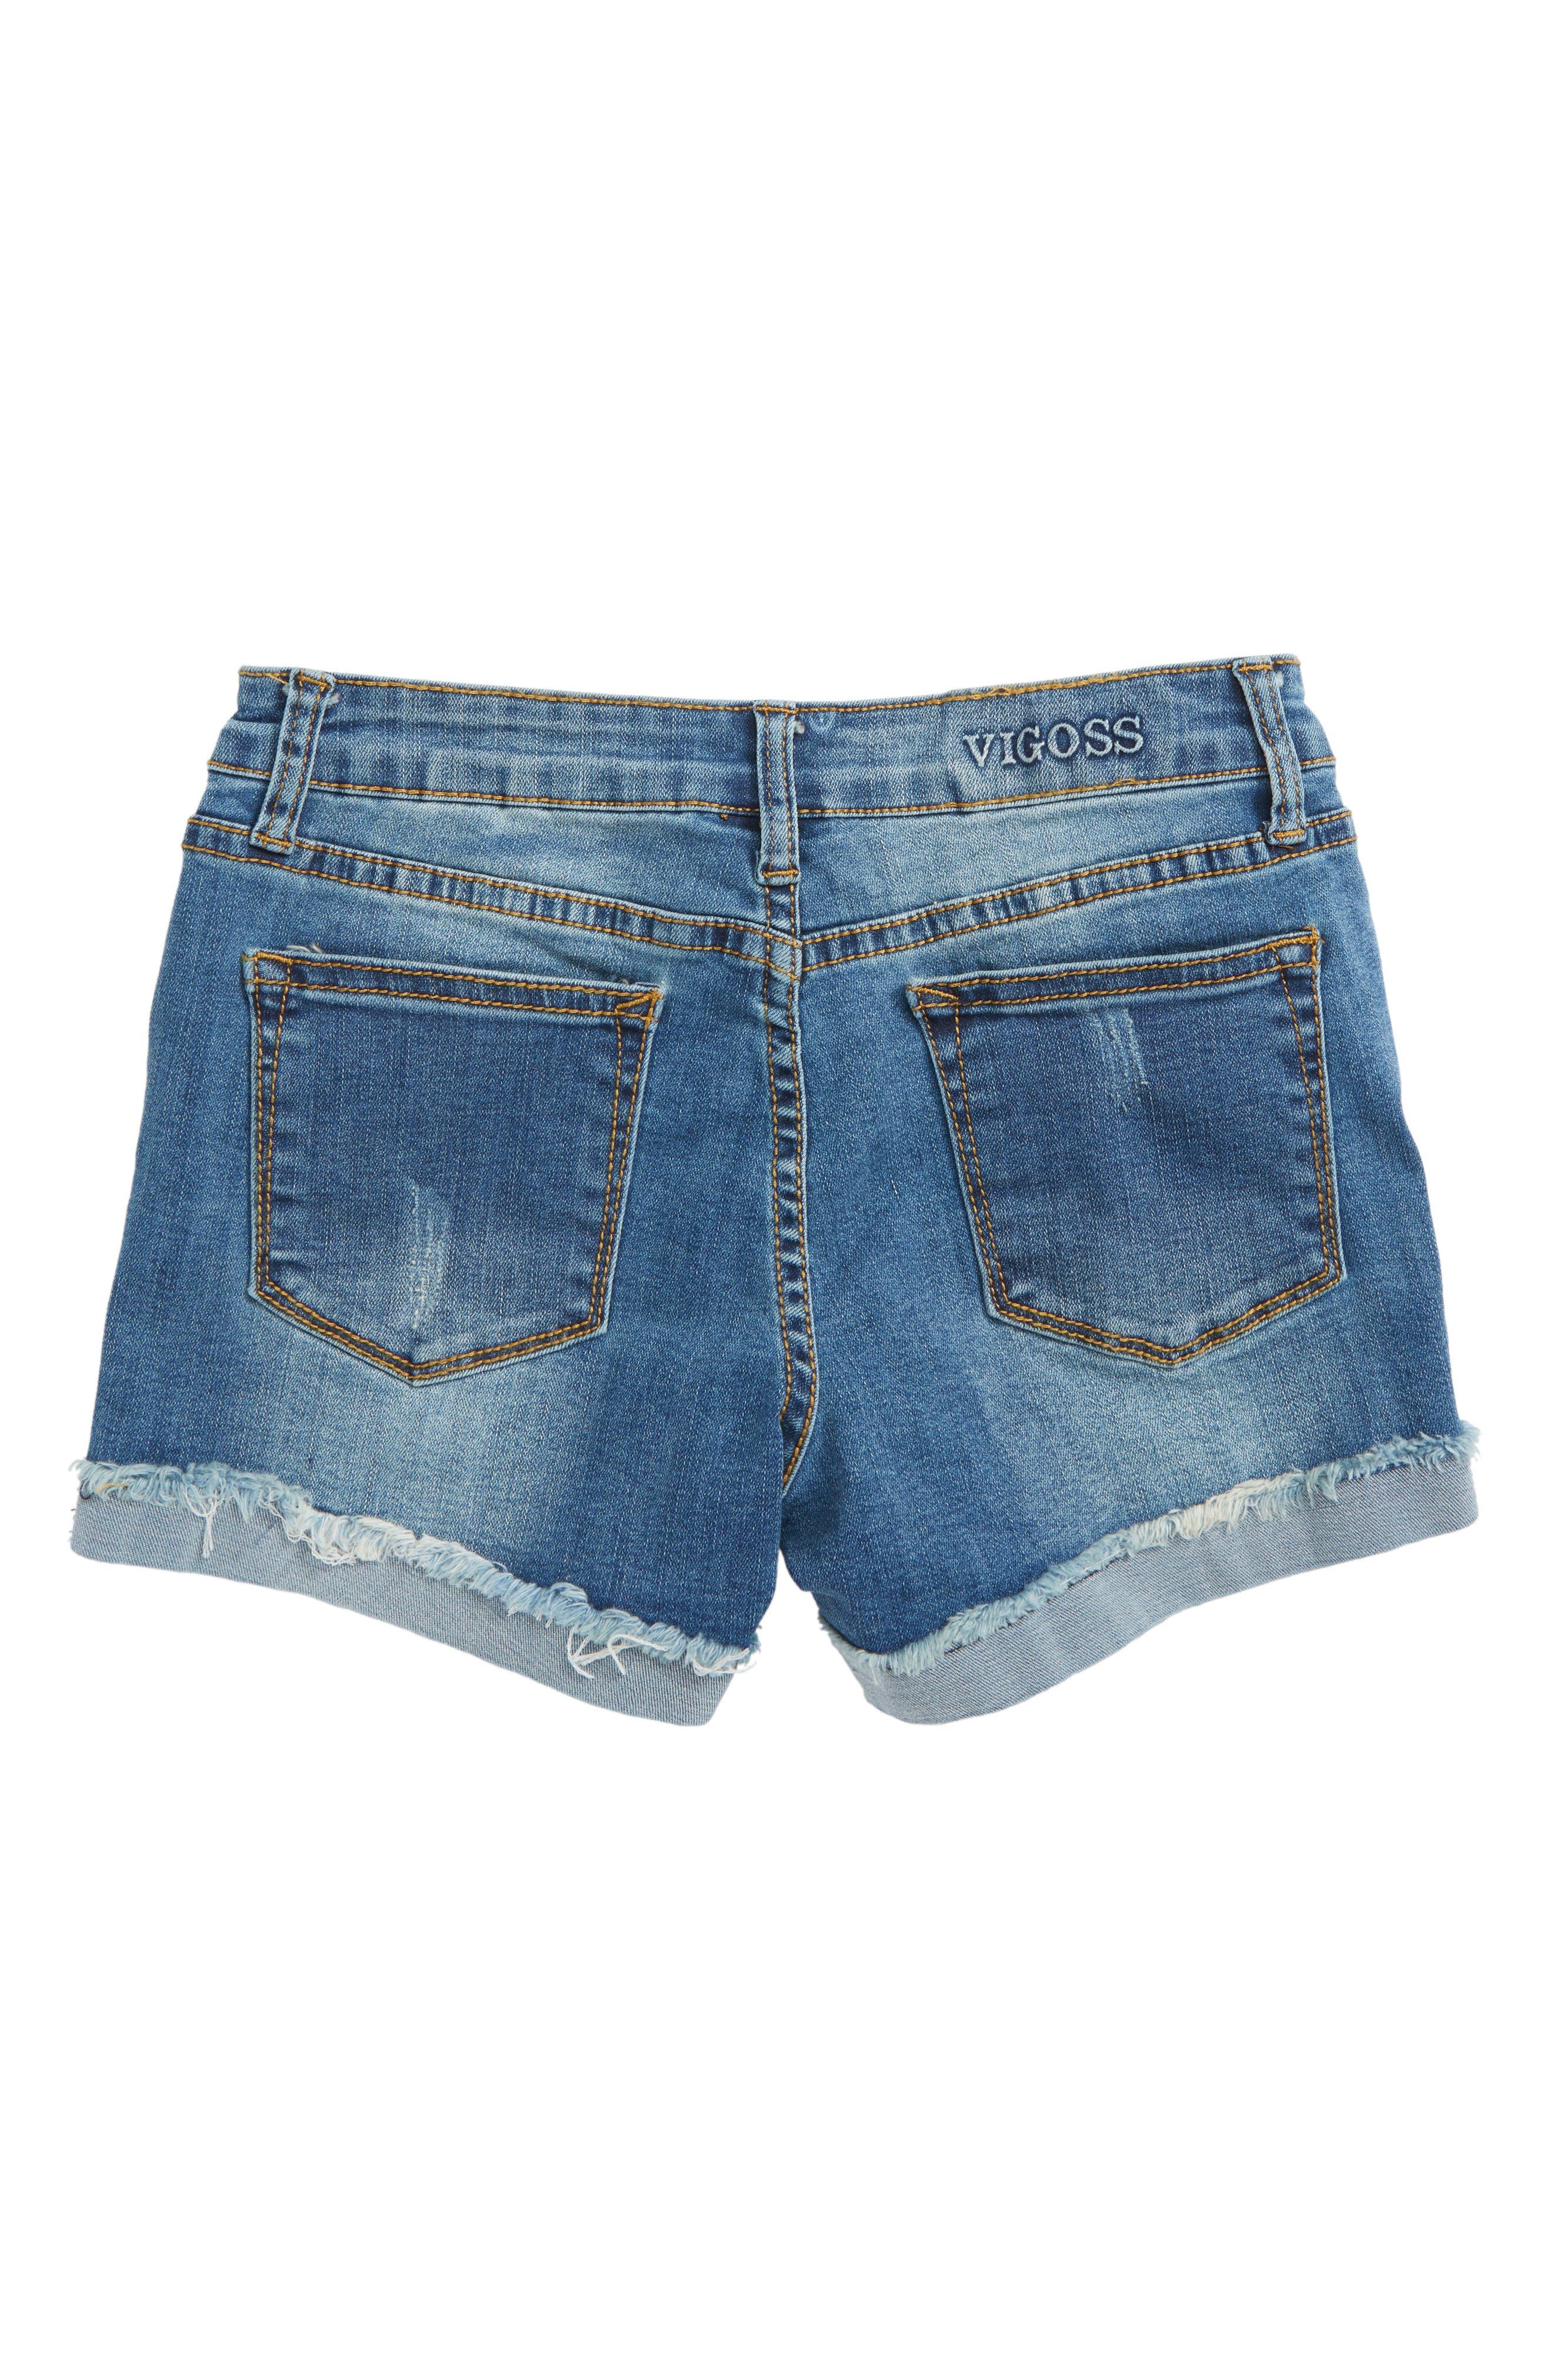 Alternate Image 2  - Vigoss Imitation Pearl Frayed Denim Shorts (Big Girls)